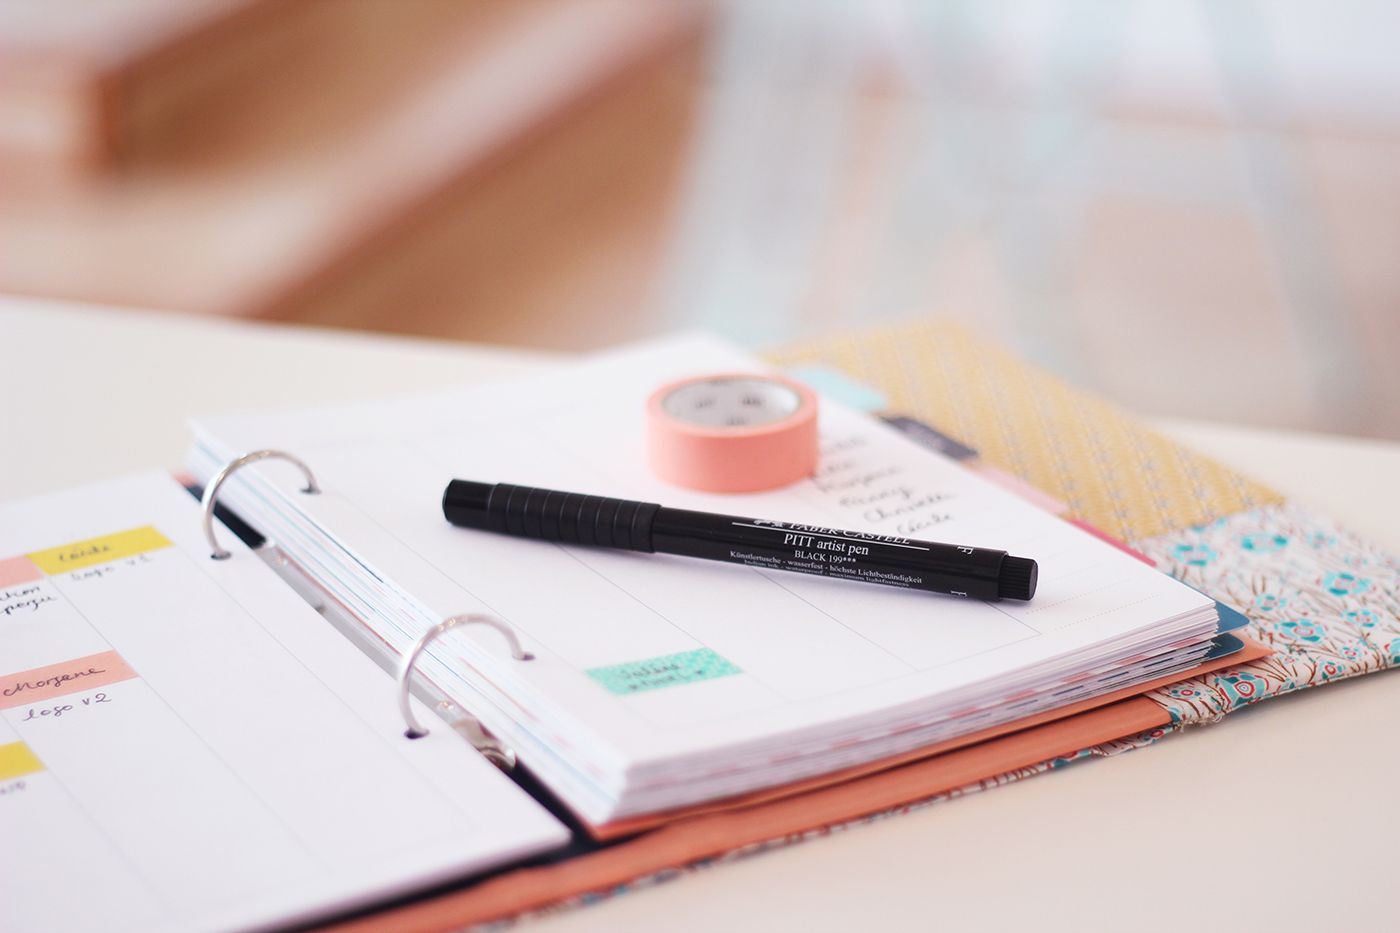 DIY planner à imprimer - Juliette blog féminin